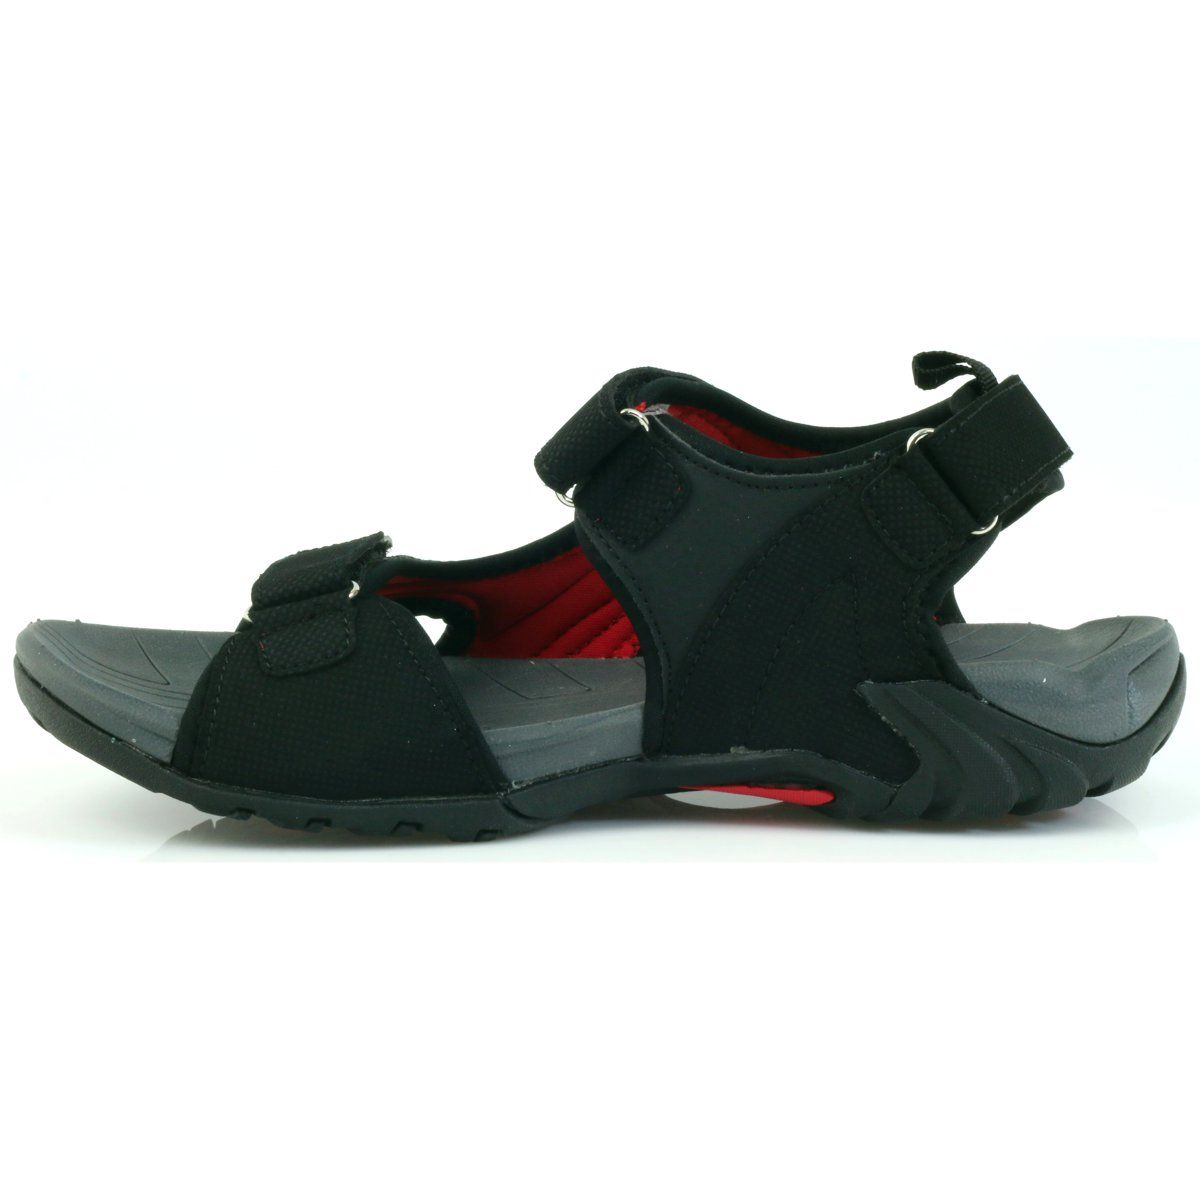 American Club American Sandaly Damskie Wkladka Piankowa Czarne Puma Fierce Sneaker Top Sneakers Sneakers